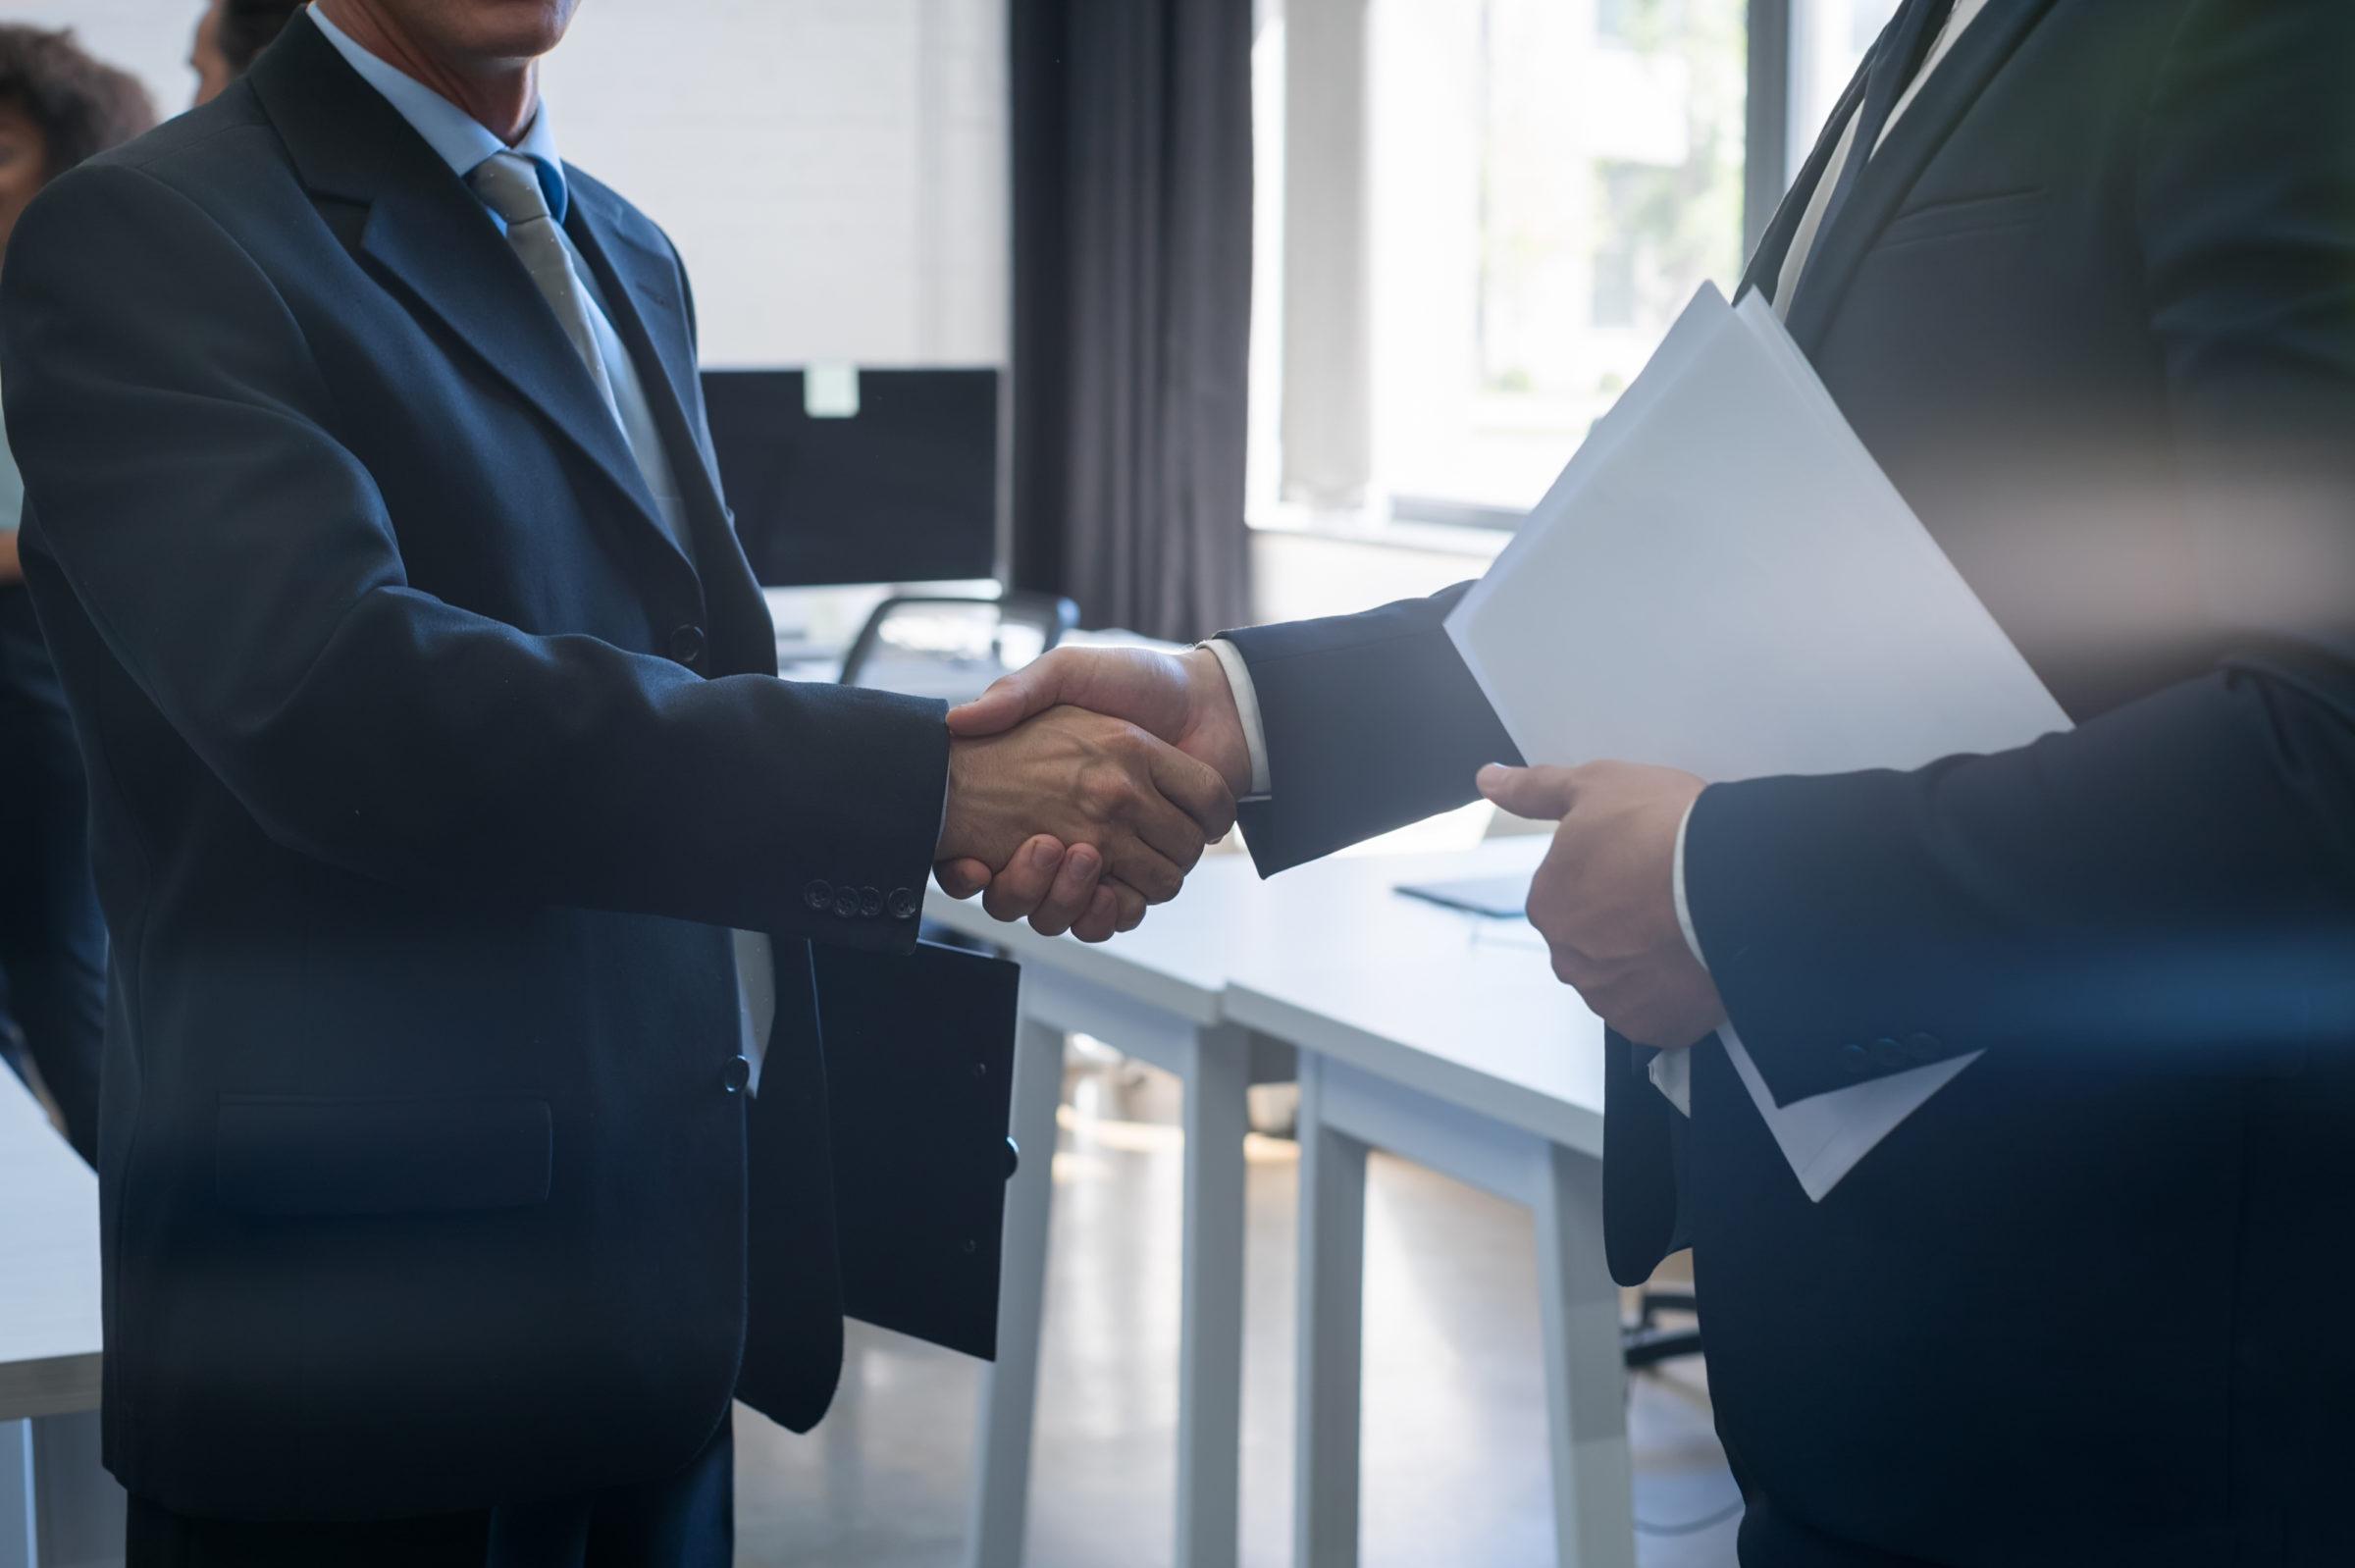 two unrecognizable business man shake hand agreeme 63J9V7E